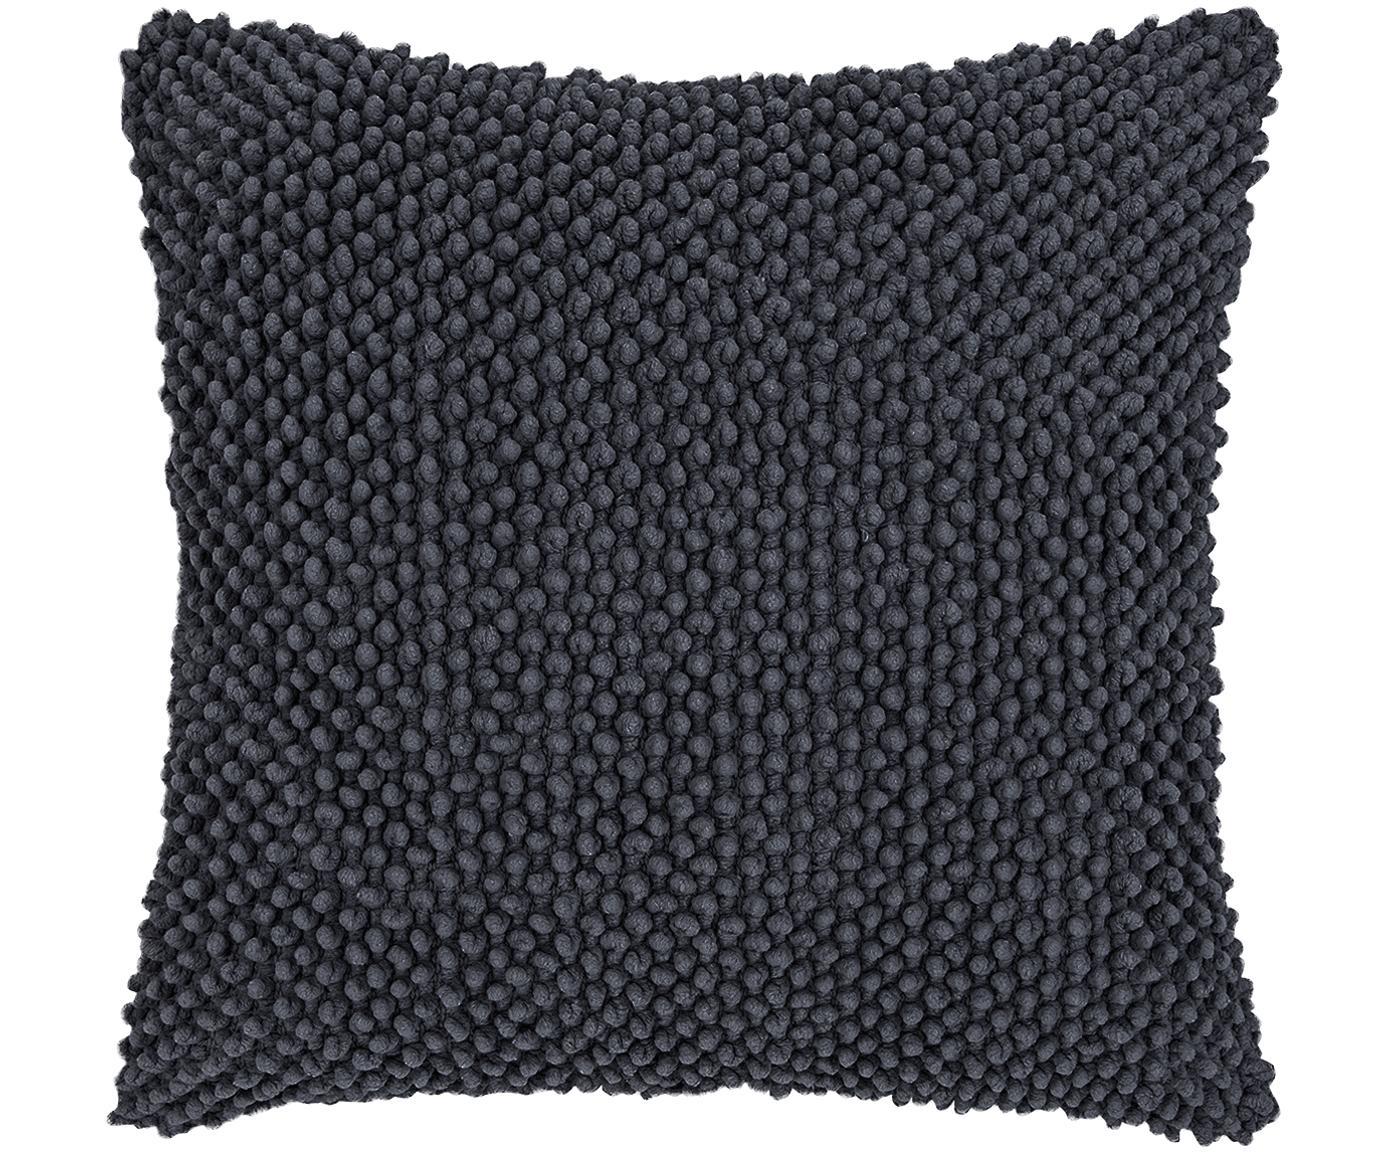 Funda de cojín texturizada Indi, Algodón, Gris oscuro, An 45 x L 45 cm